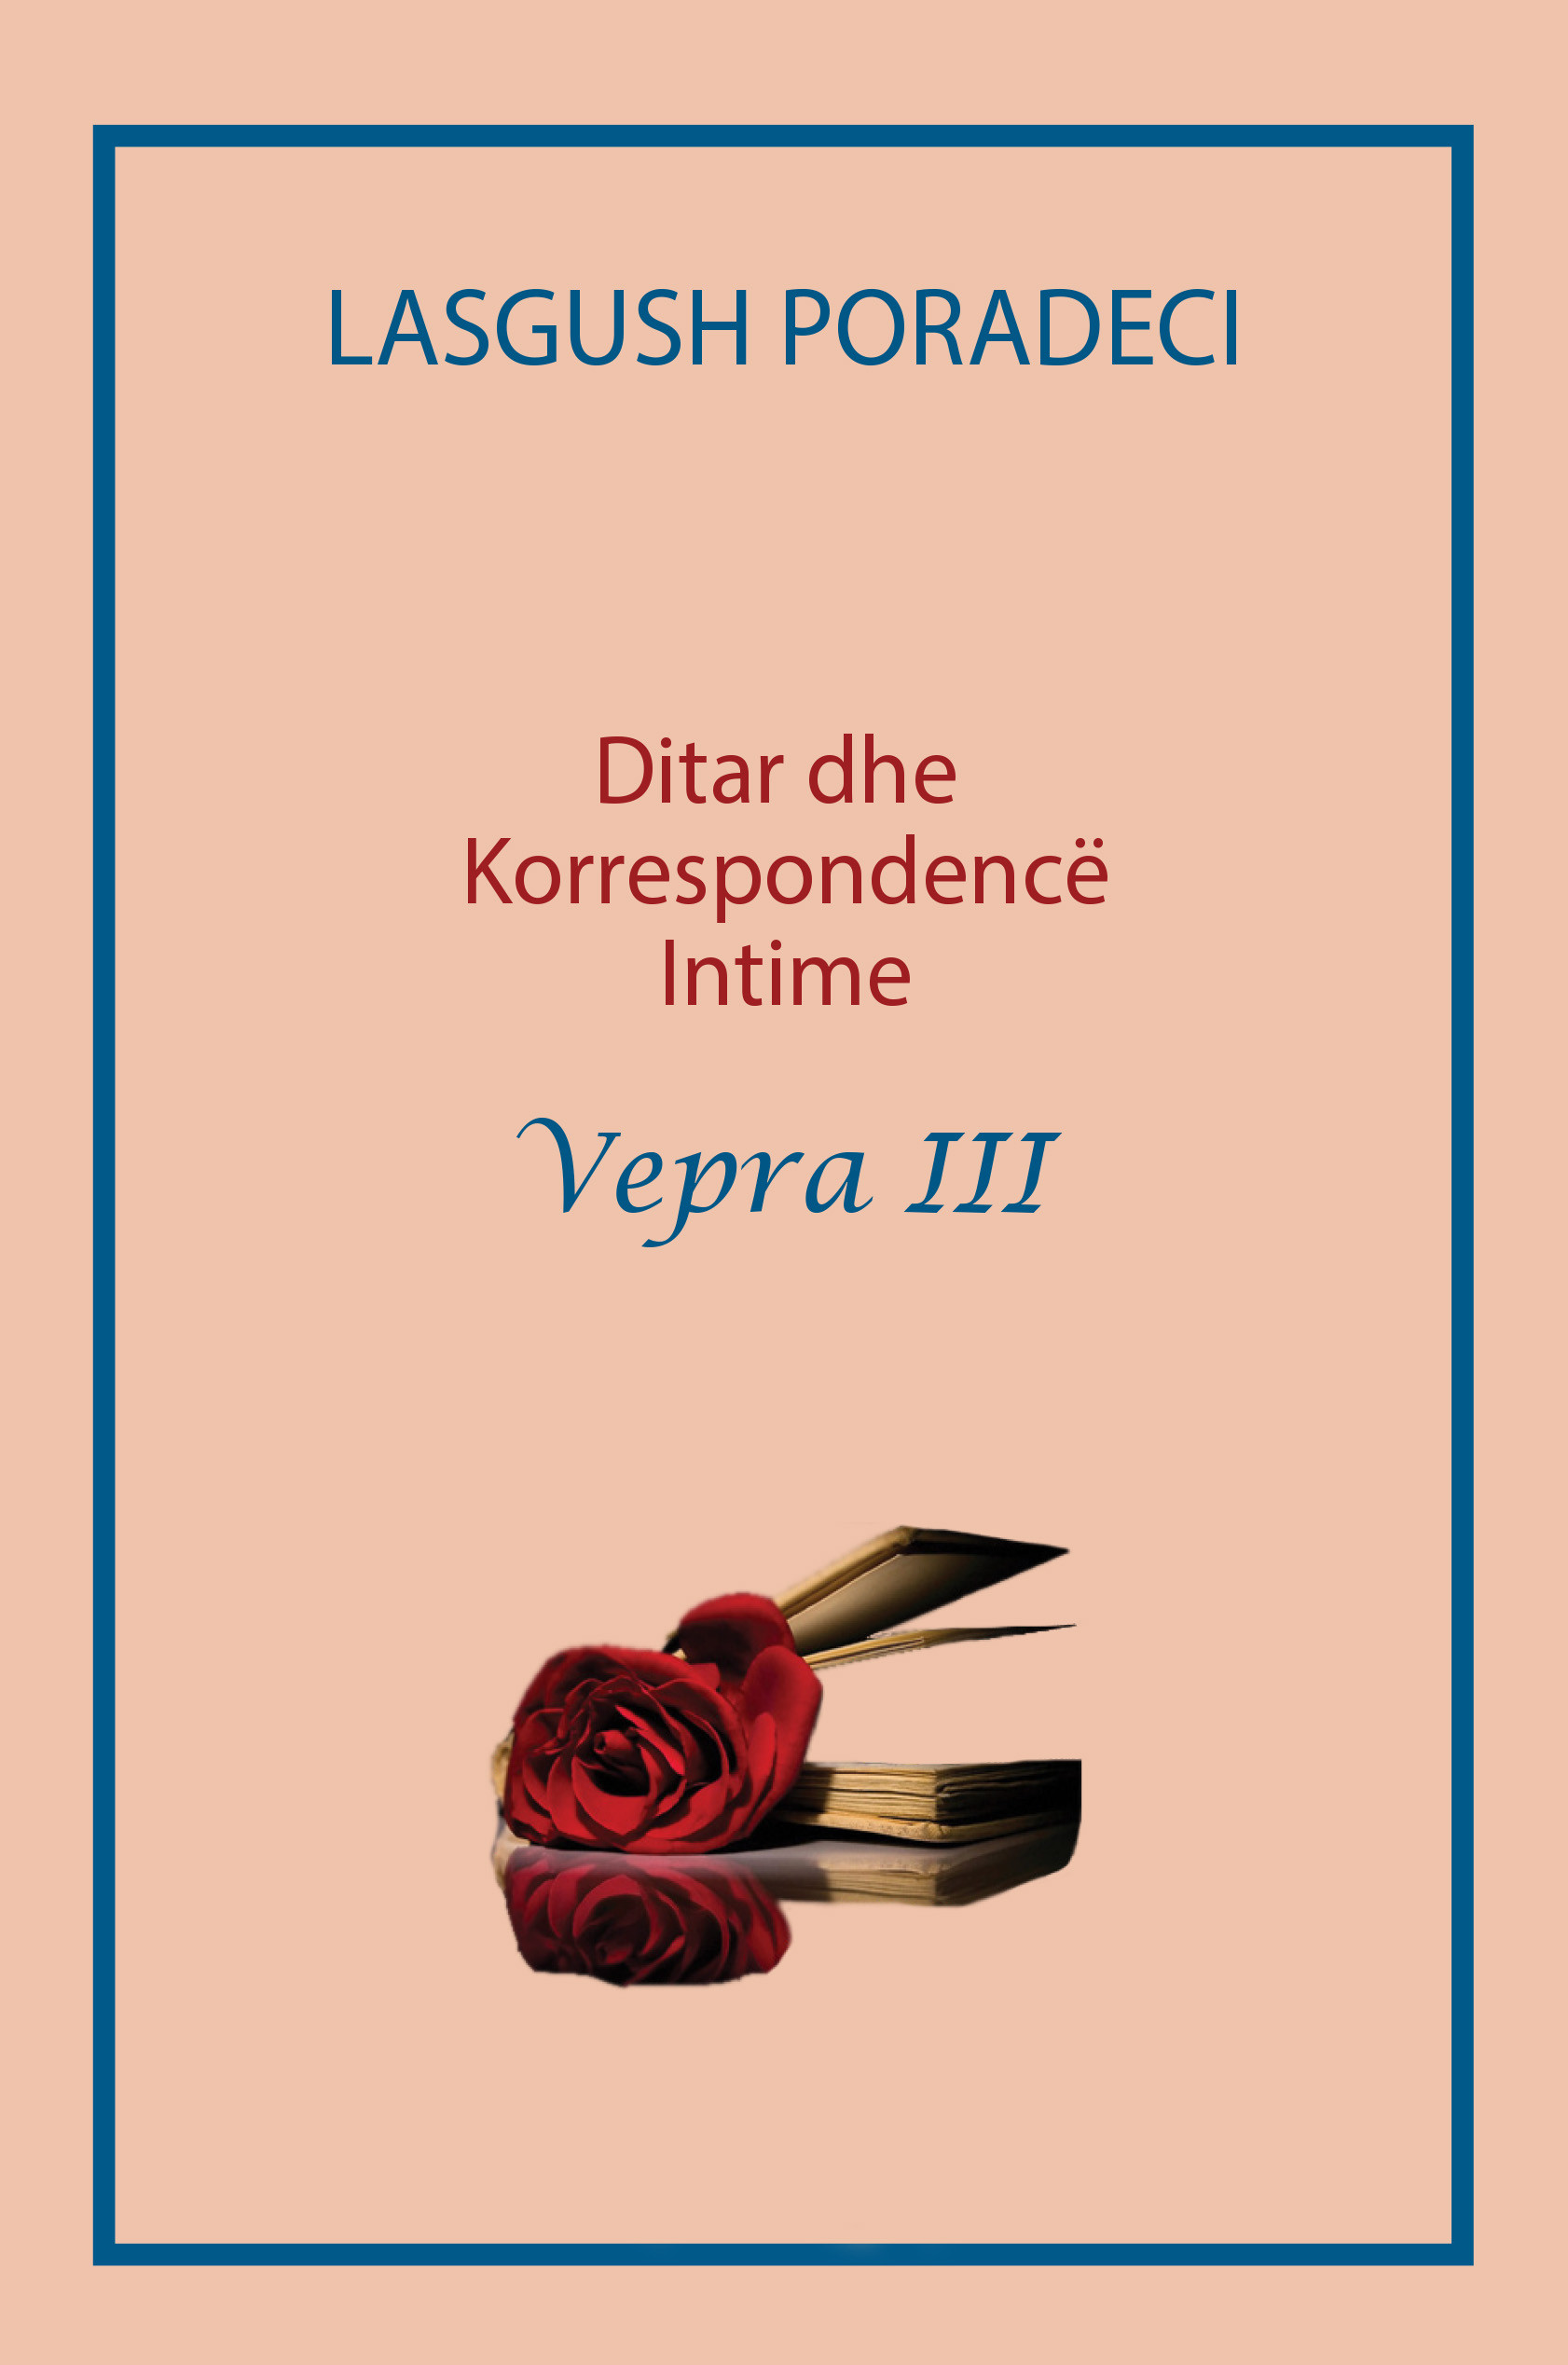 Lasgush Poradeci - Vepra III